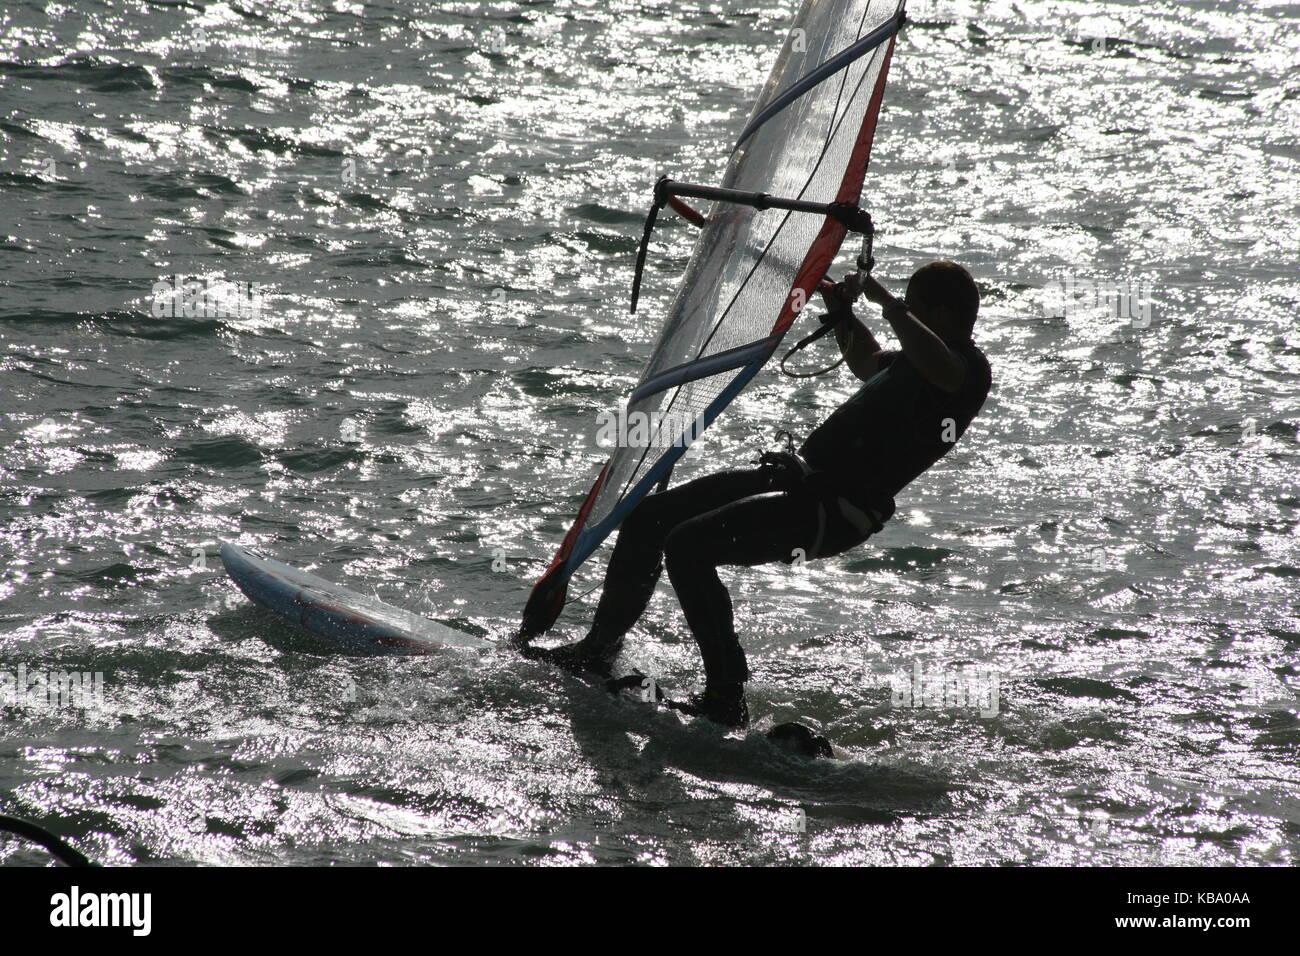 Surfer on surfboard with sail --- Surfer auf Surfboard mit Segel - Stock Image